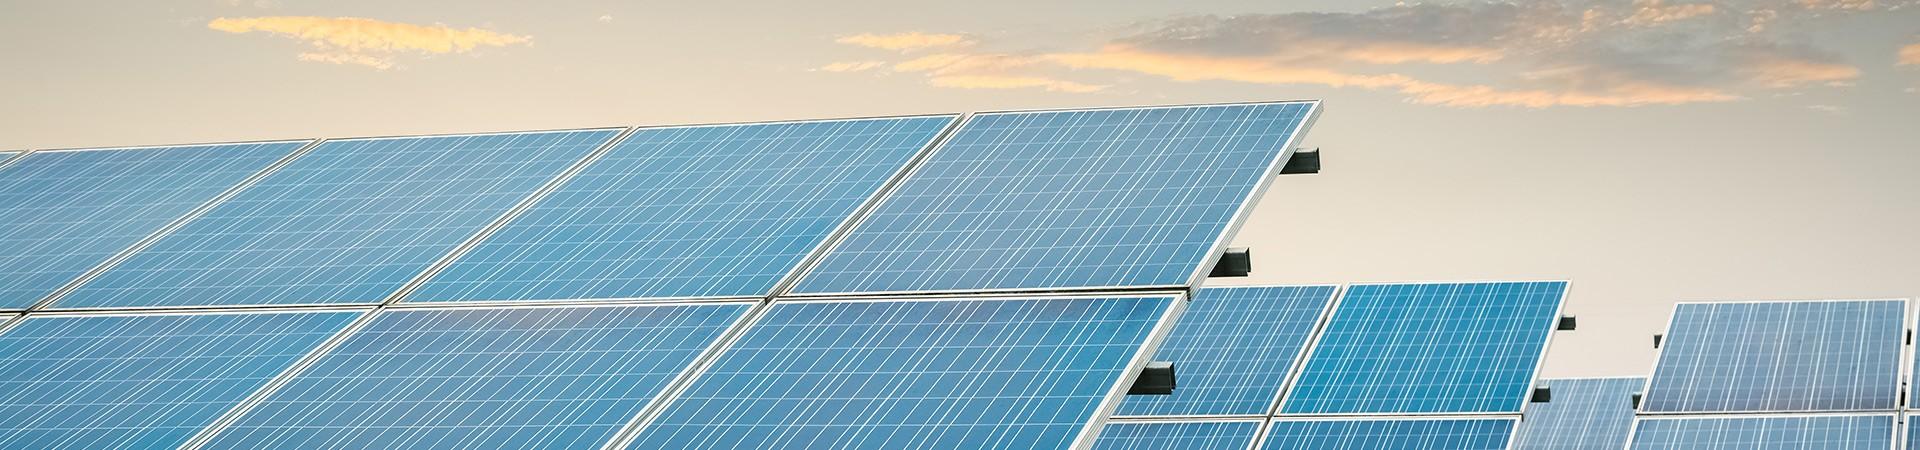 Duurzame energievormen